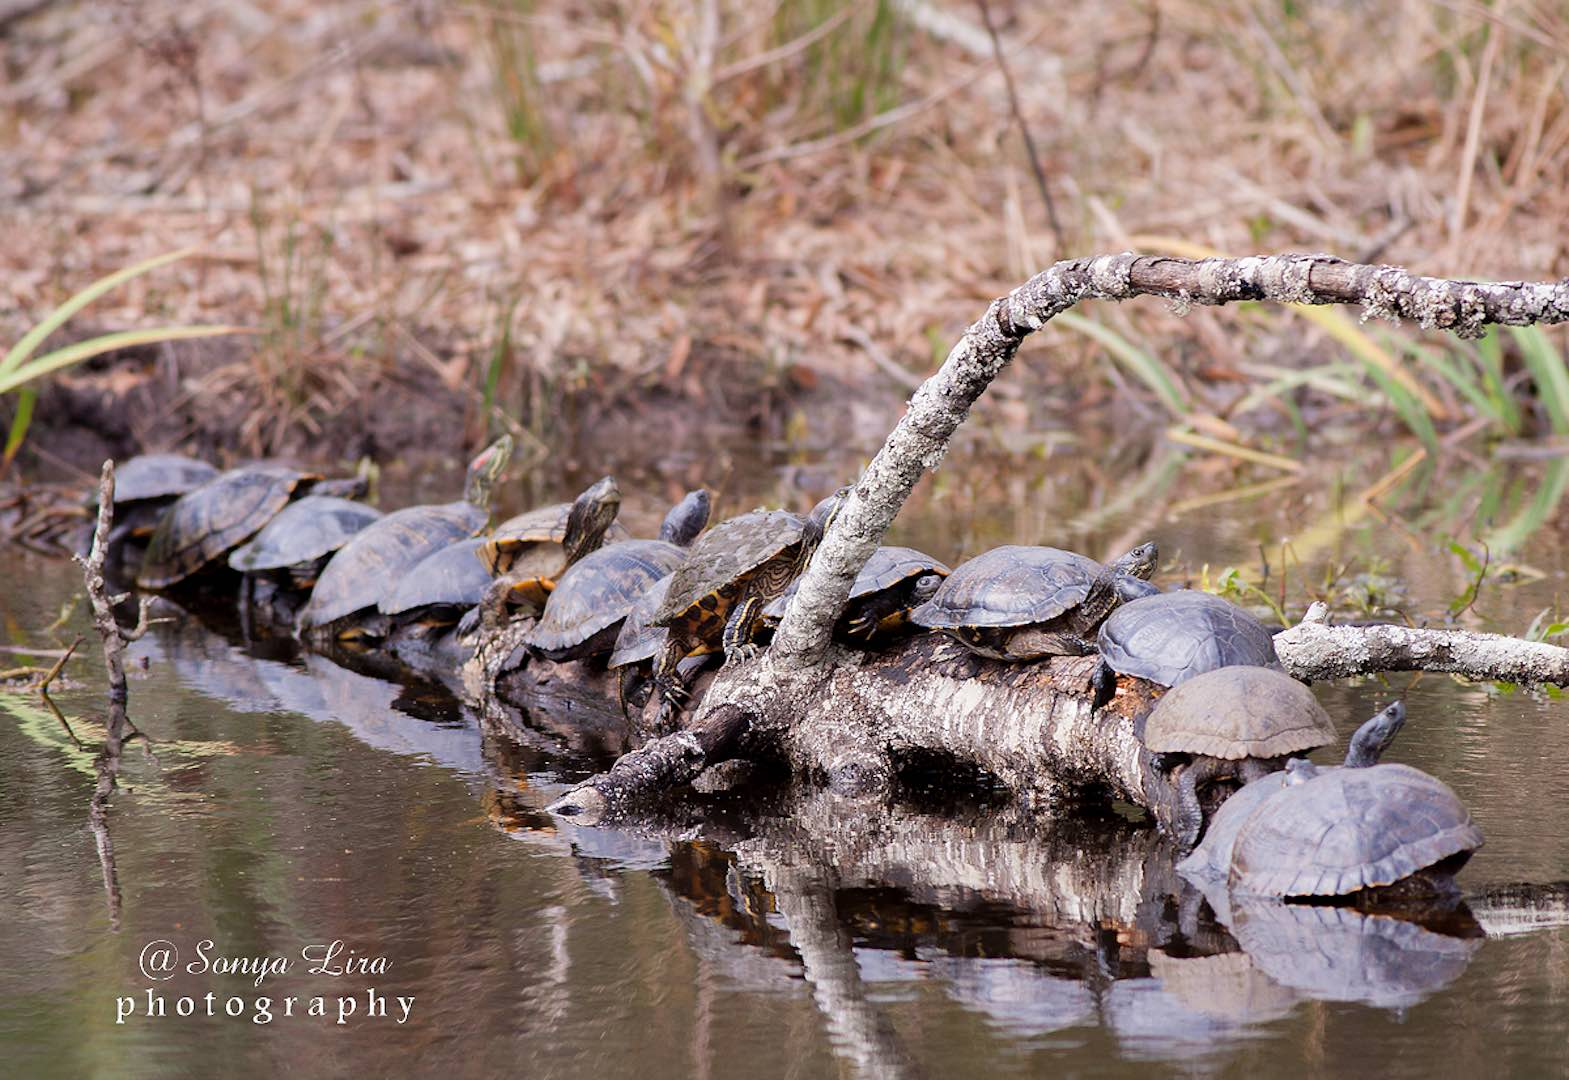 Les tortues dans un étang